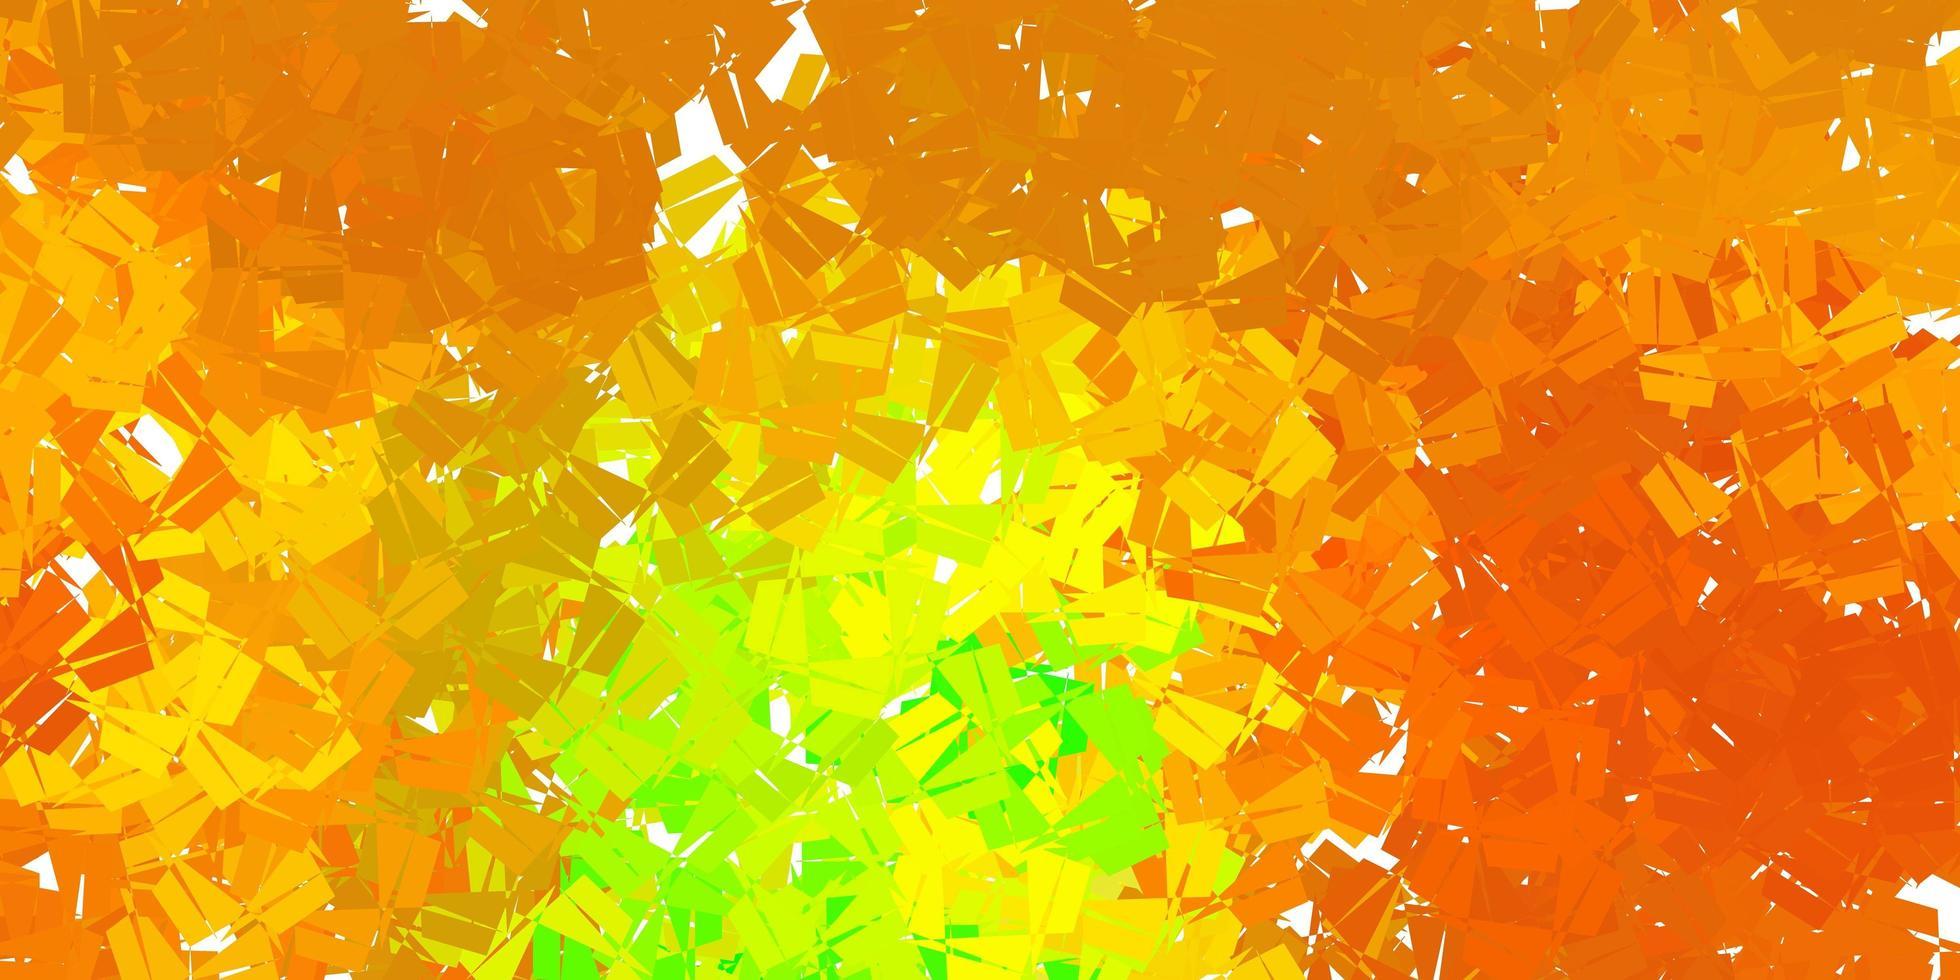 diseño poligonal geométrico vector verde oscuro, amarillo.